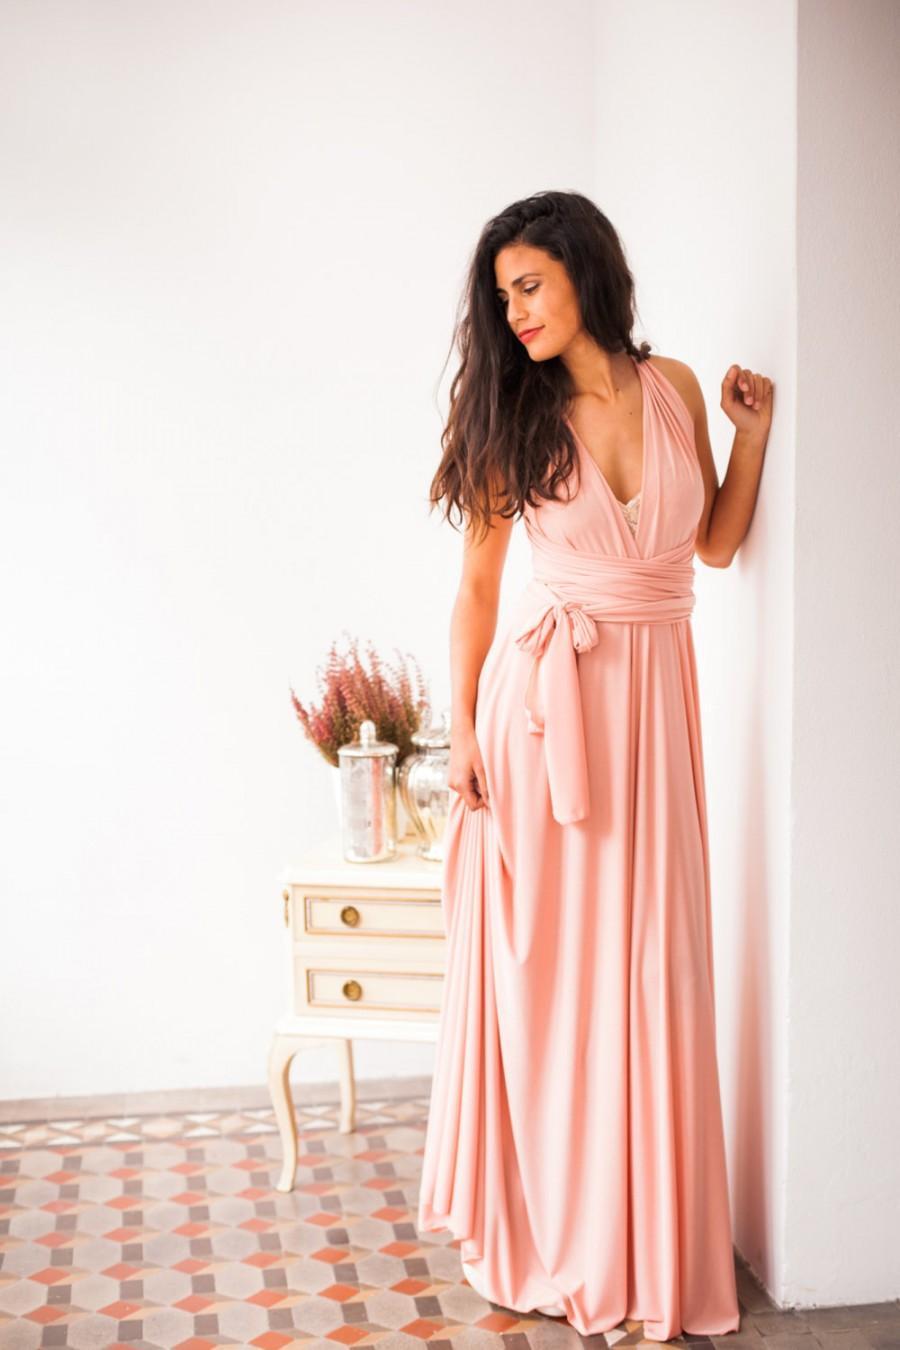 Peach Bridesmaid Dress Long Infinity Light Pink Maxi Event Convertible